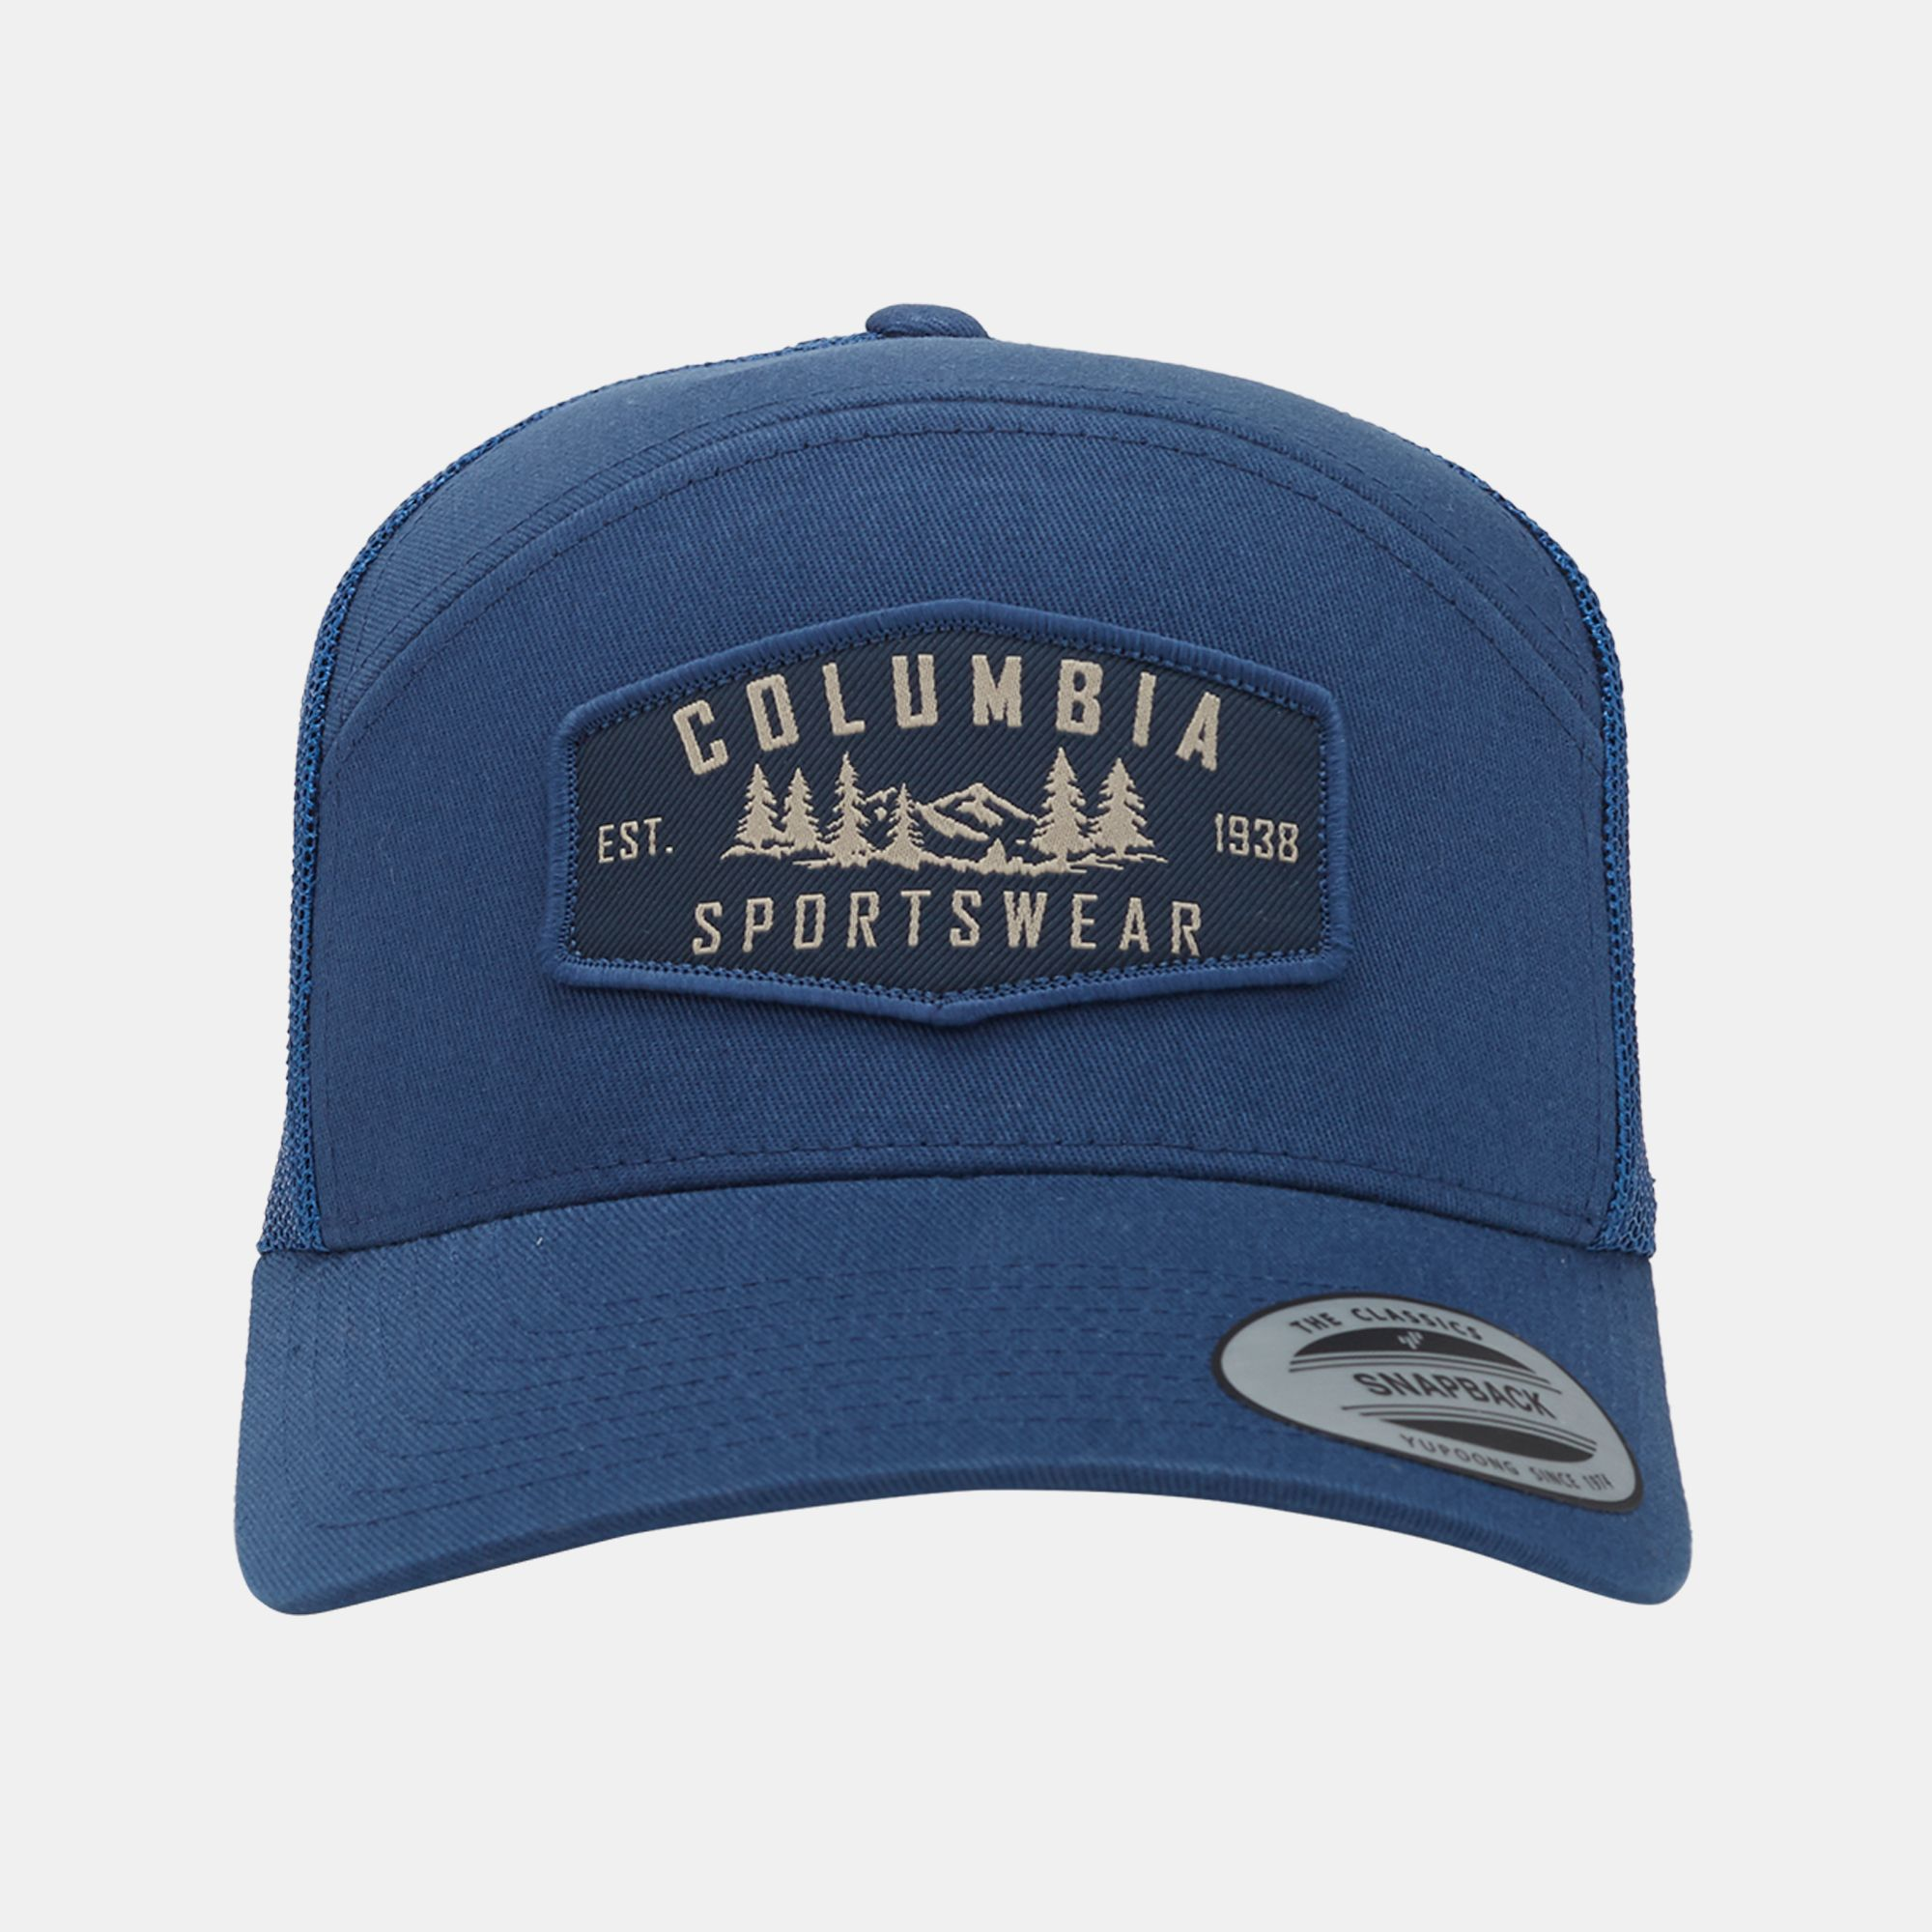 Shop Black Columbia Trail Evolution™ Snap Back Hat for Unisex by ... d6ec4a8cbd2a